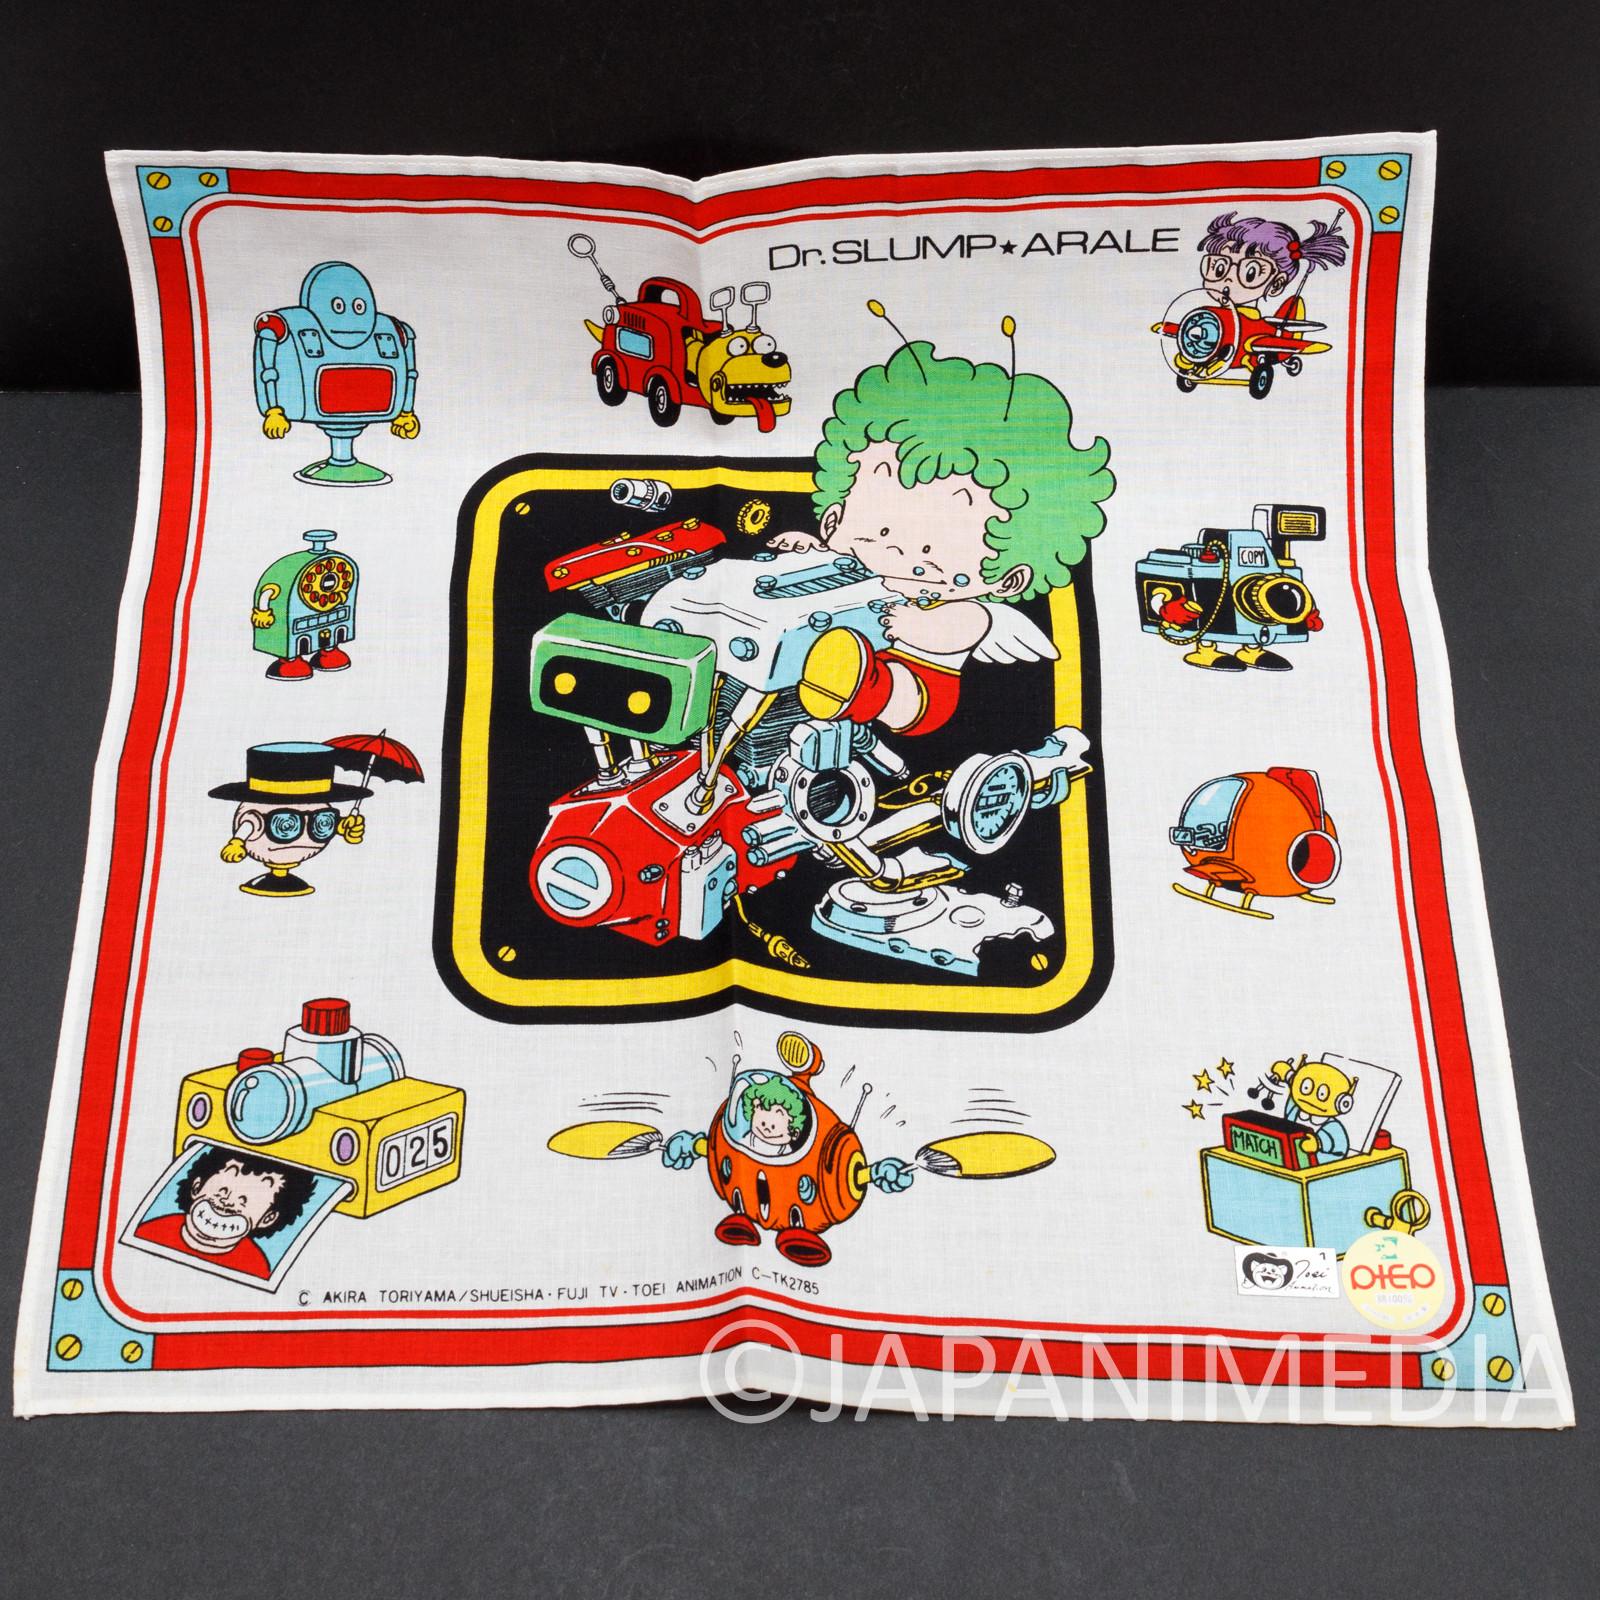 Dr. Slump Arale chan #3 Handkerchief 12 x 12 inch JAPAN ANIME